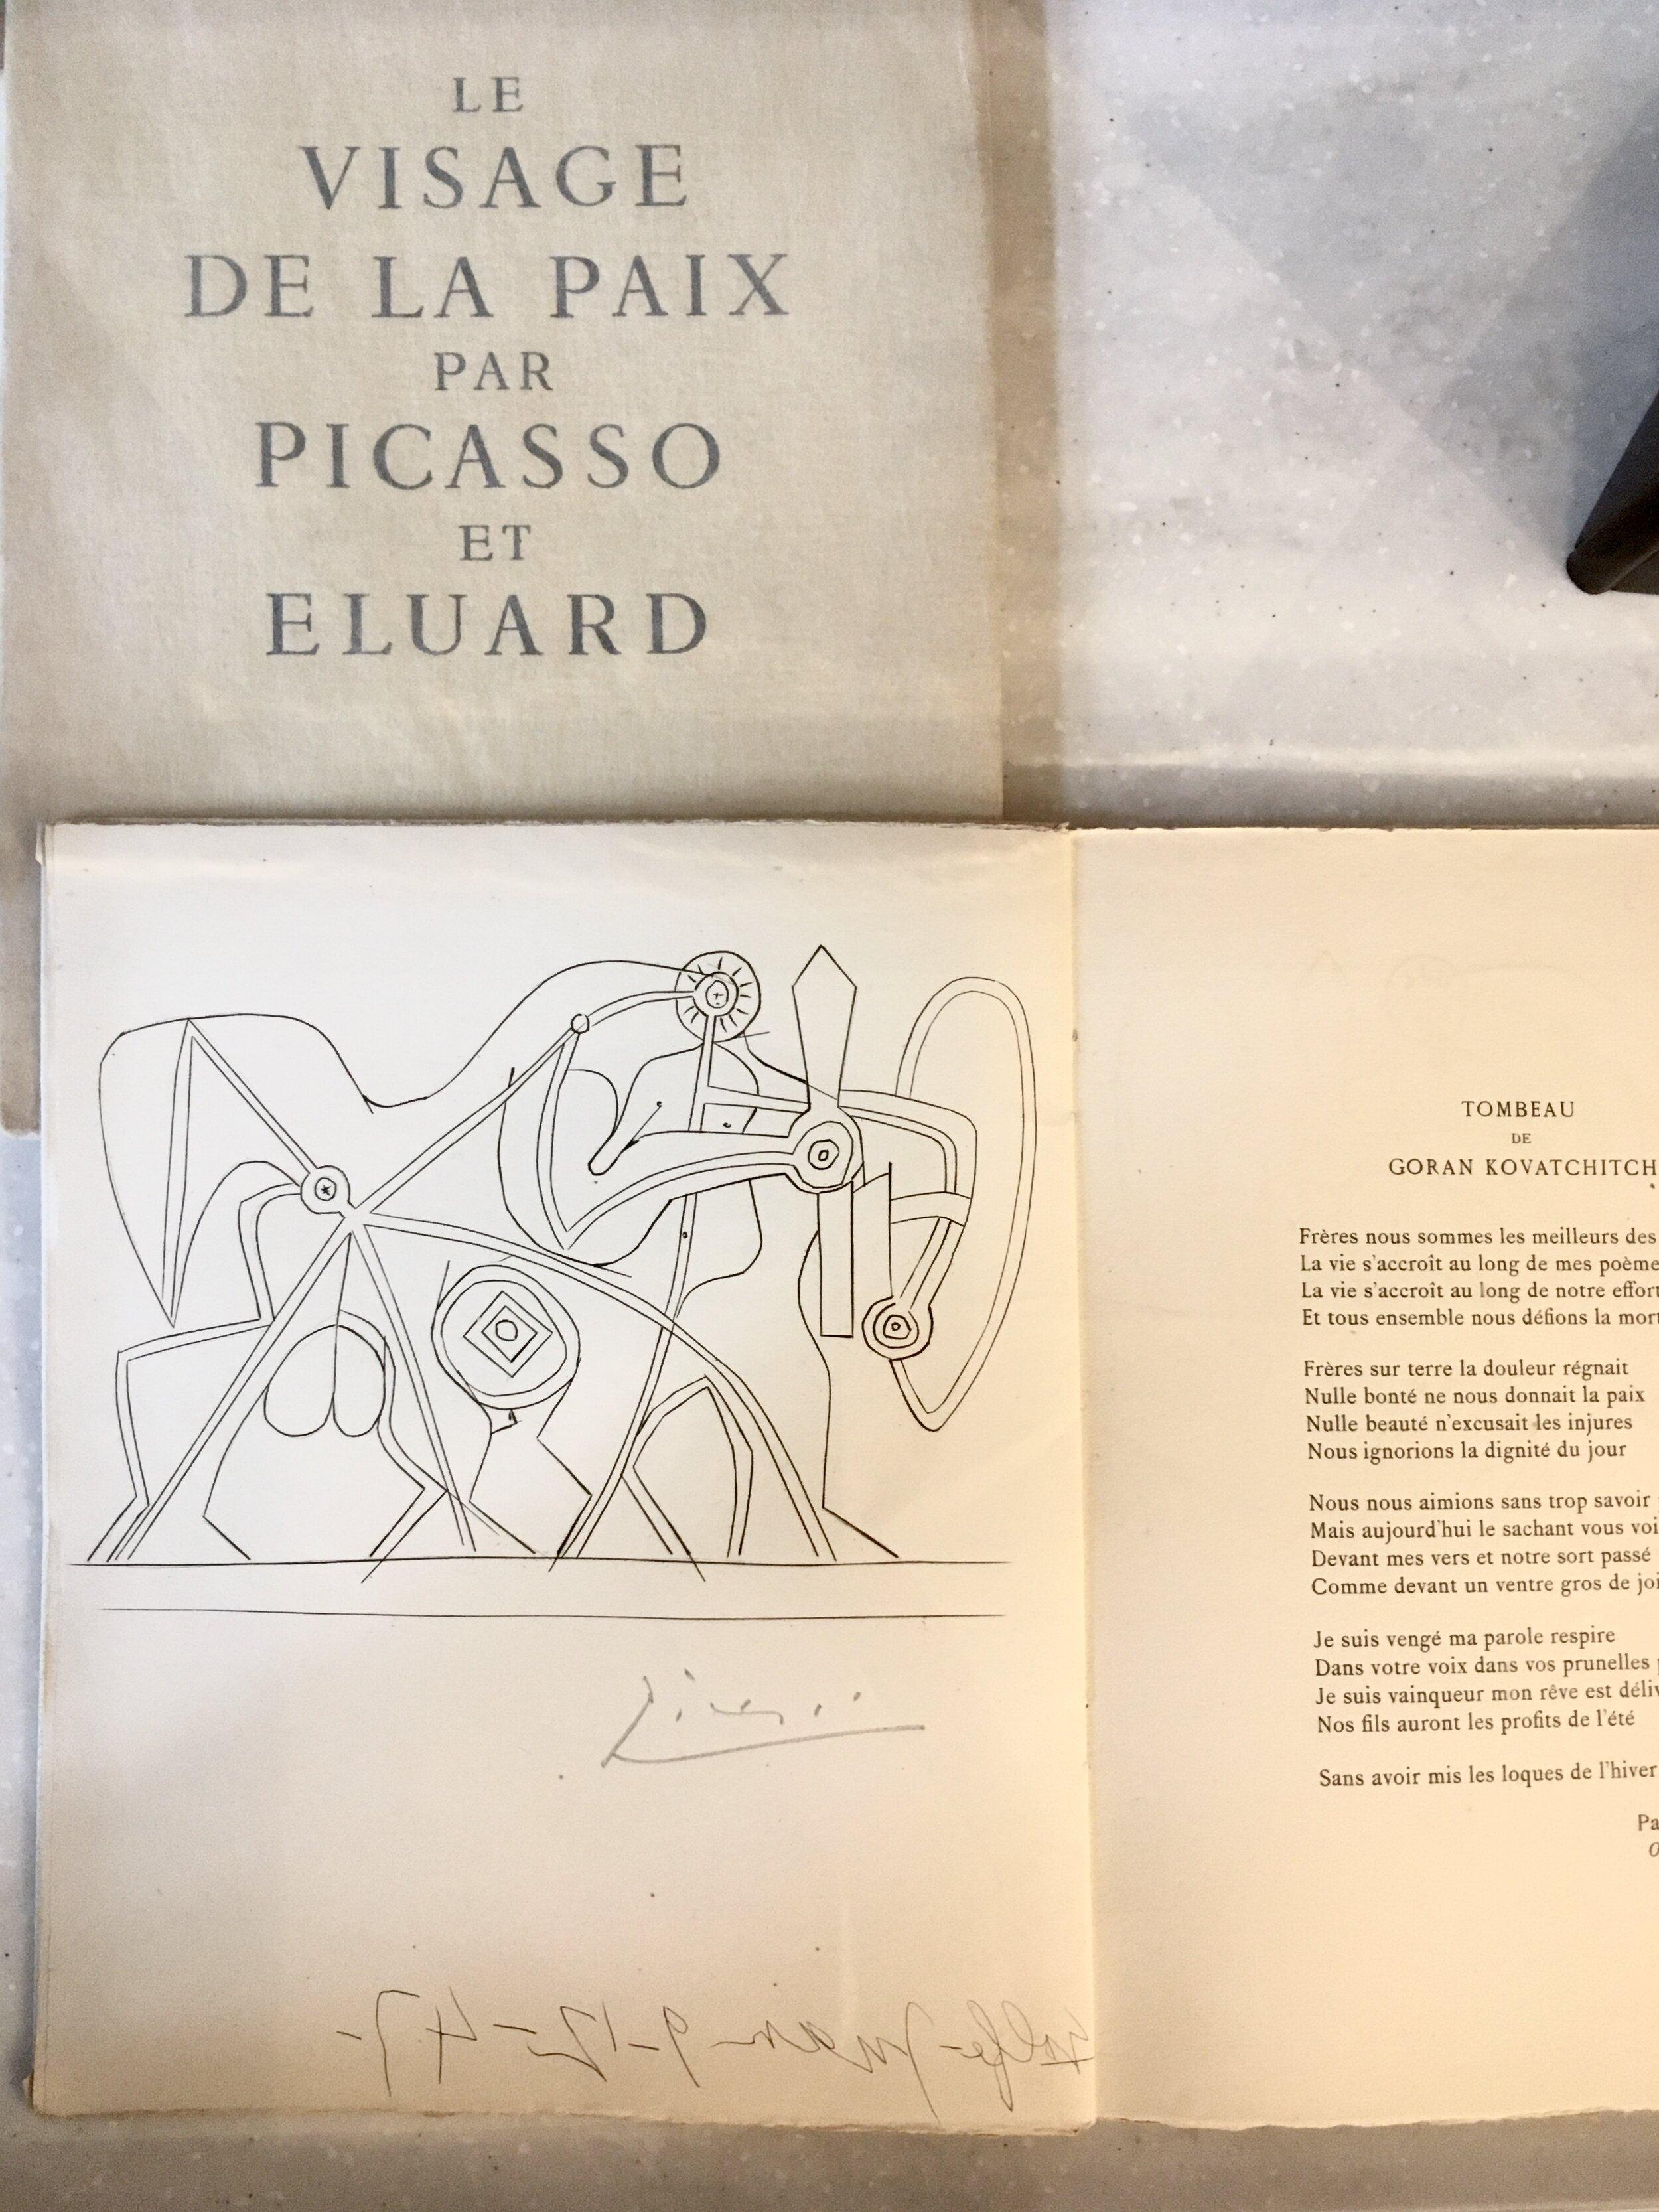 Prph Books Picasso Les Livres Dartiste The Collection